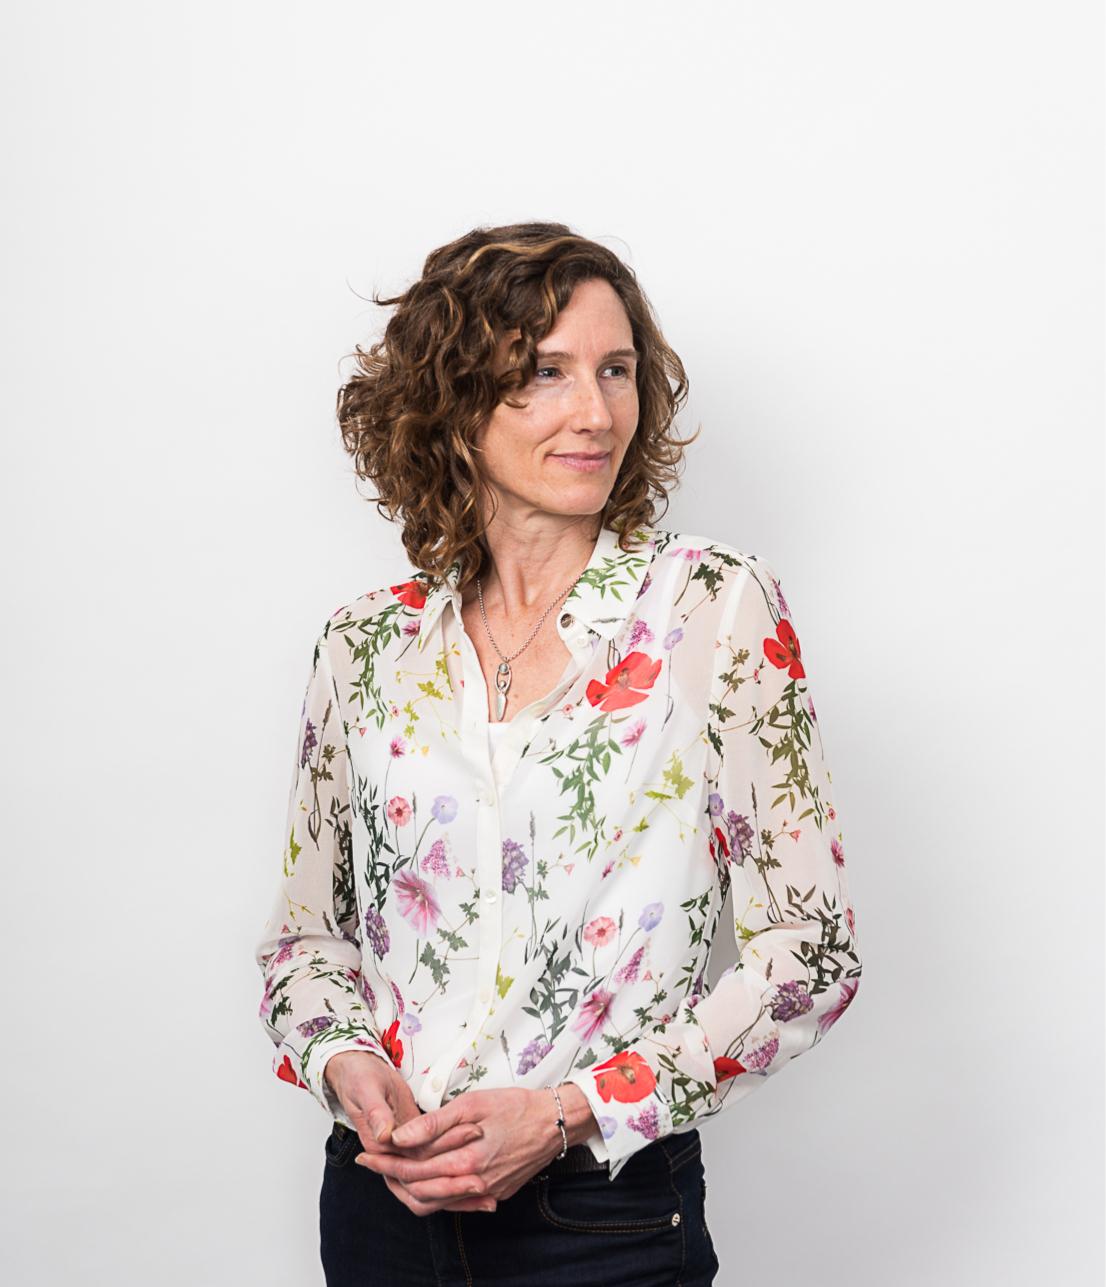 Amy Newton, consultant finance director